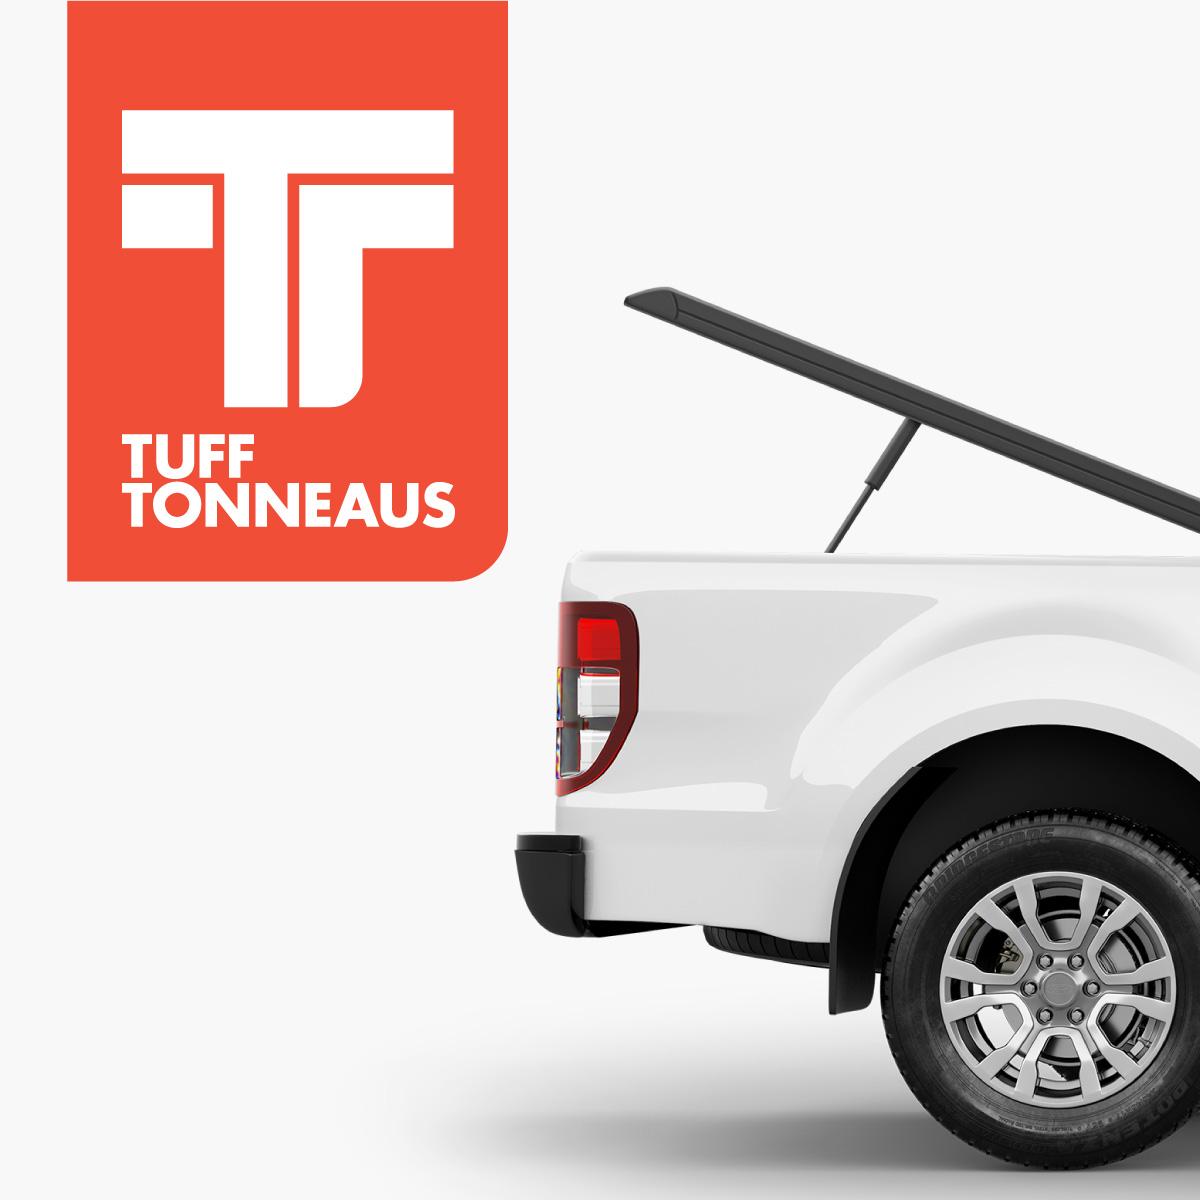 Tuff Tonneaus Brand Identity Design